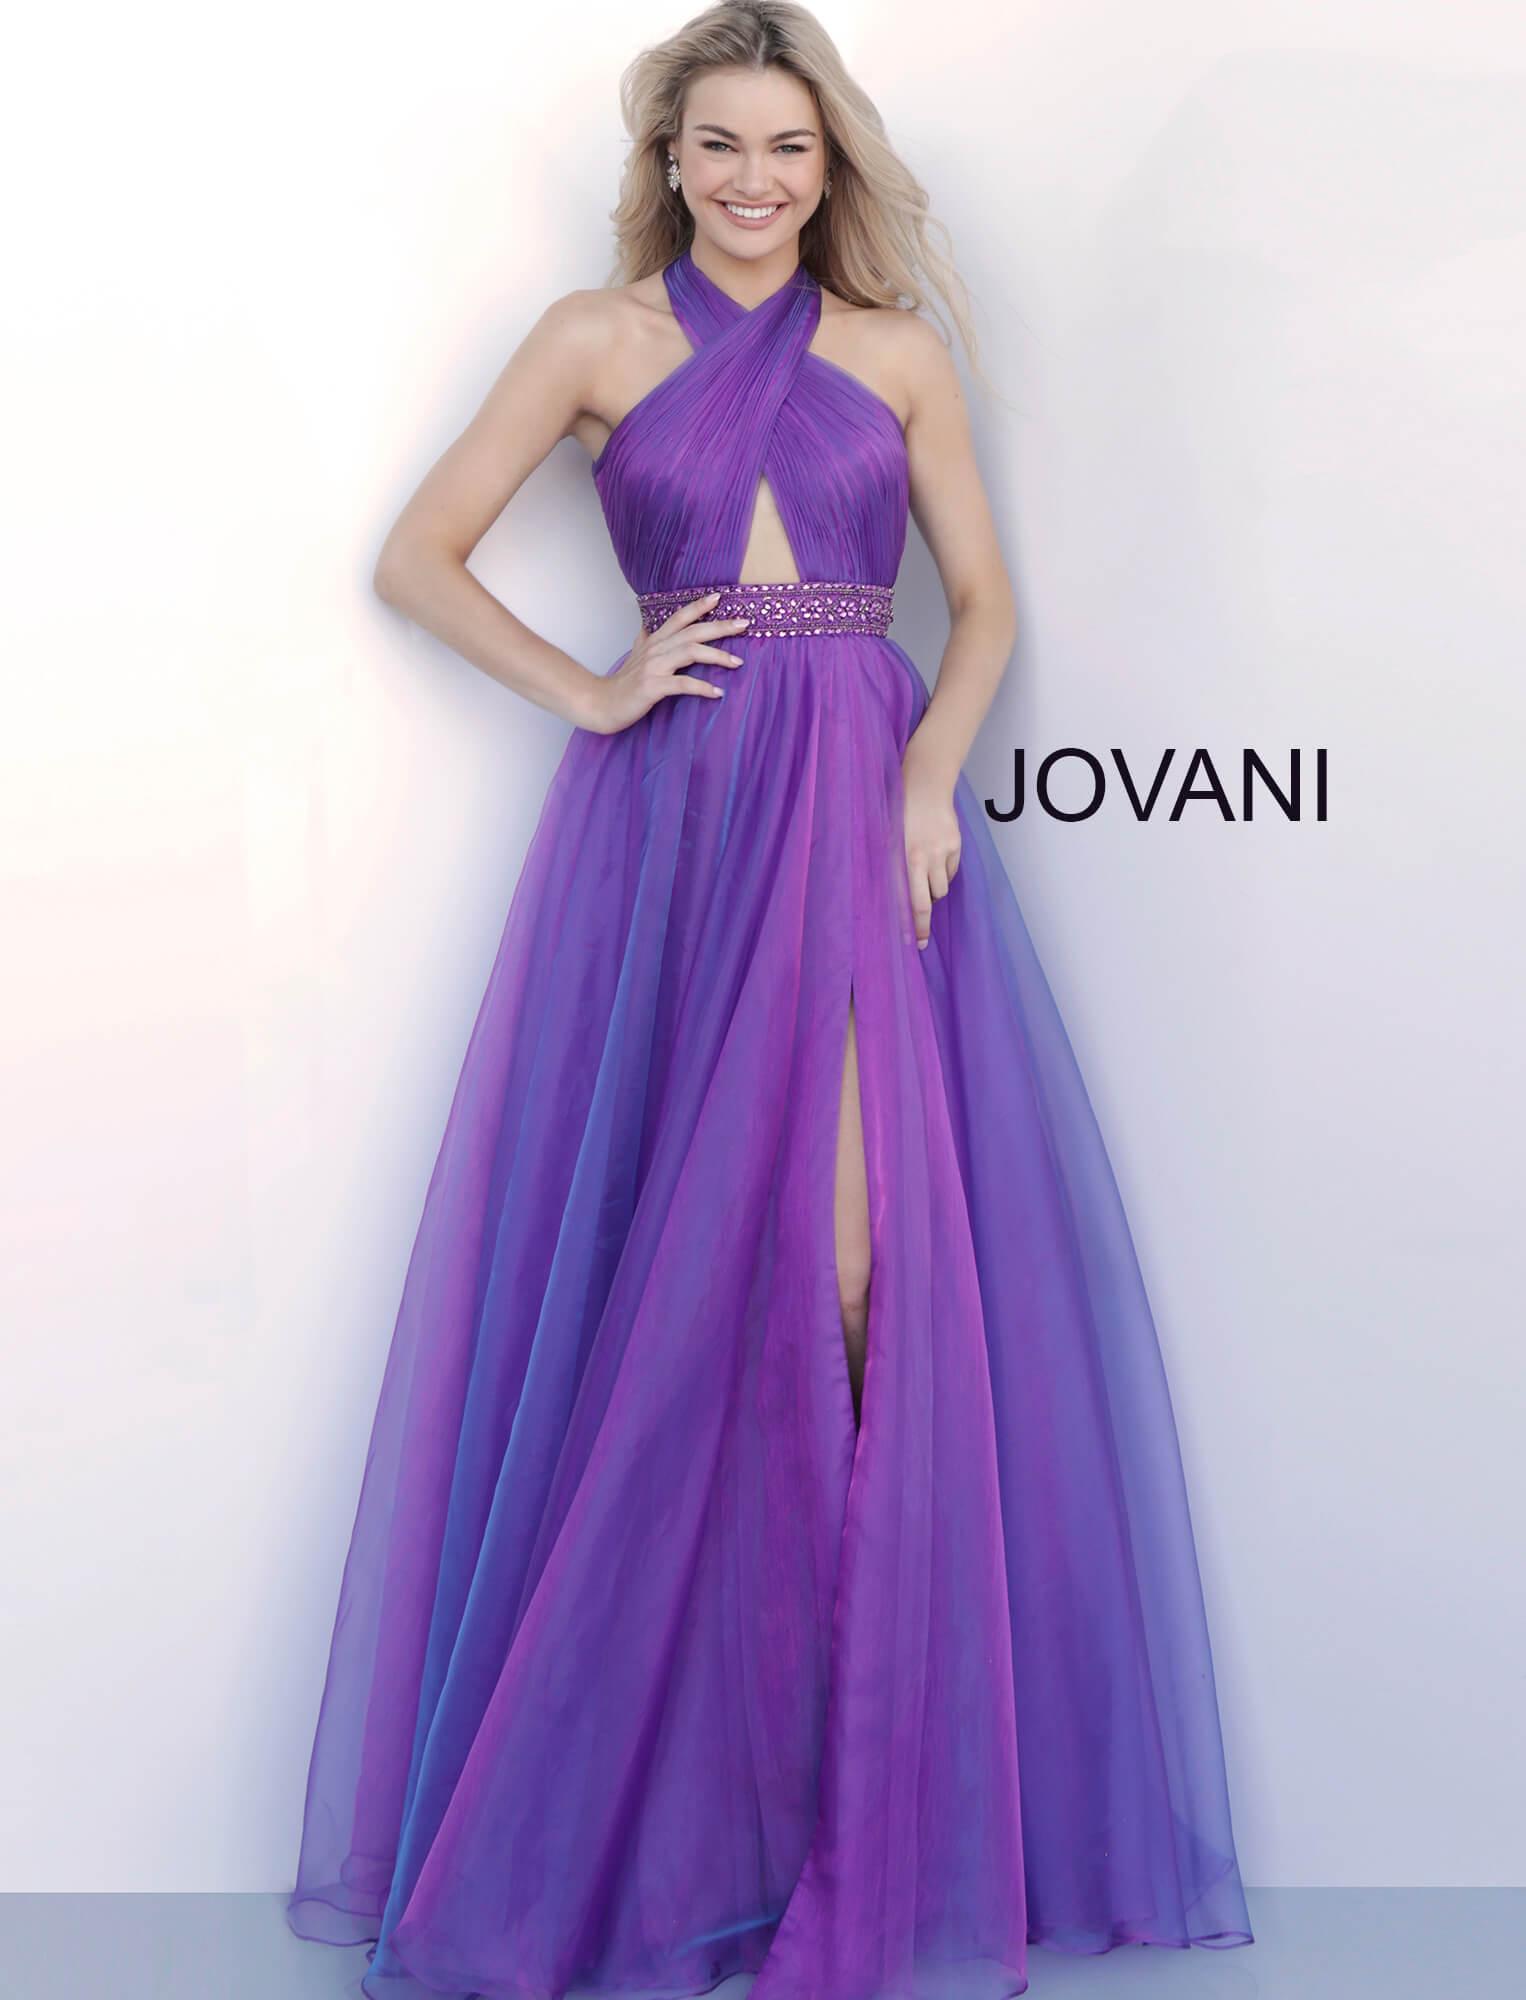 62636-purple.jpg